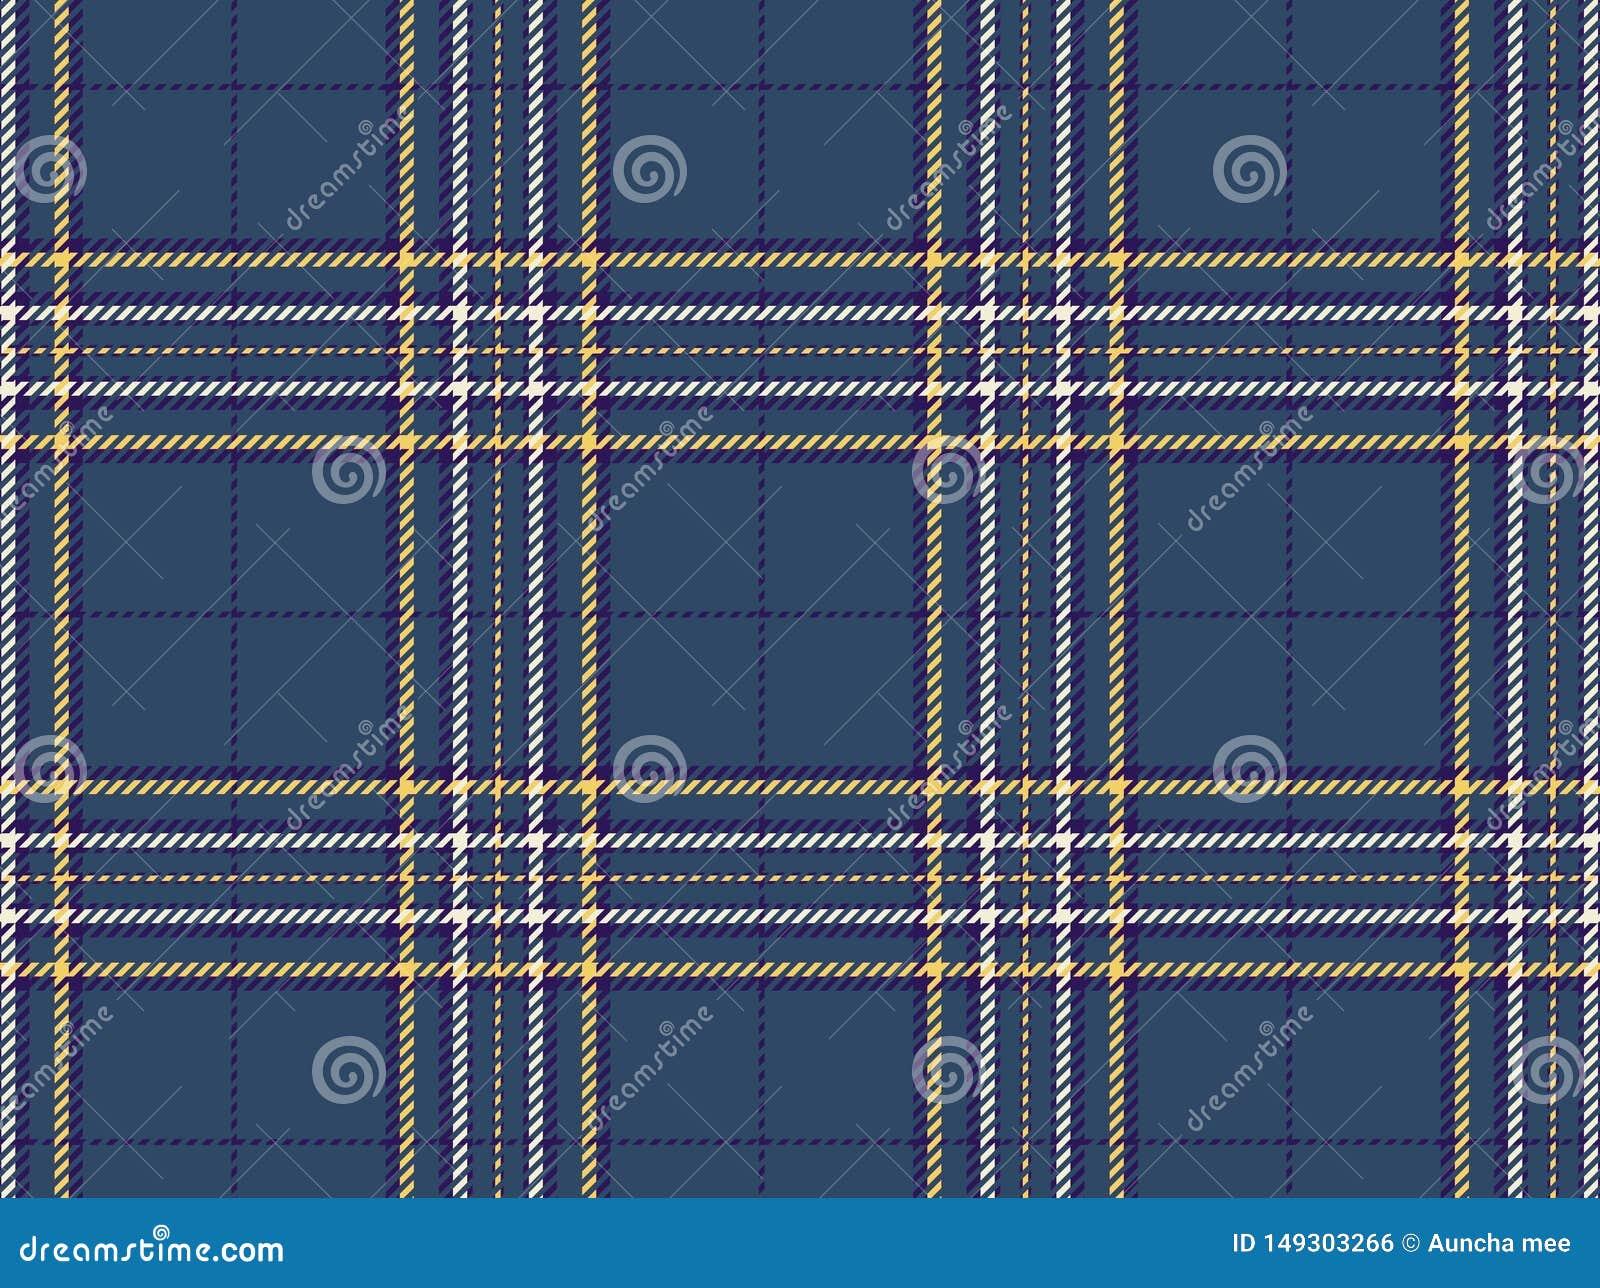 Tartan seamless pattern background. Illustration design